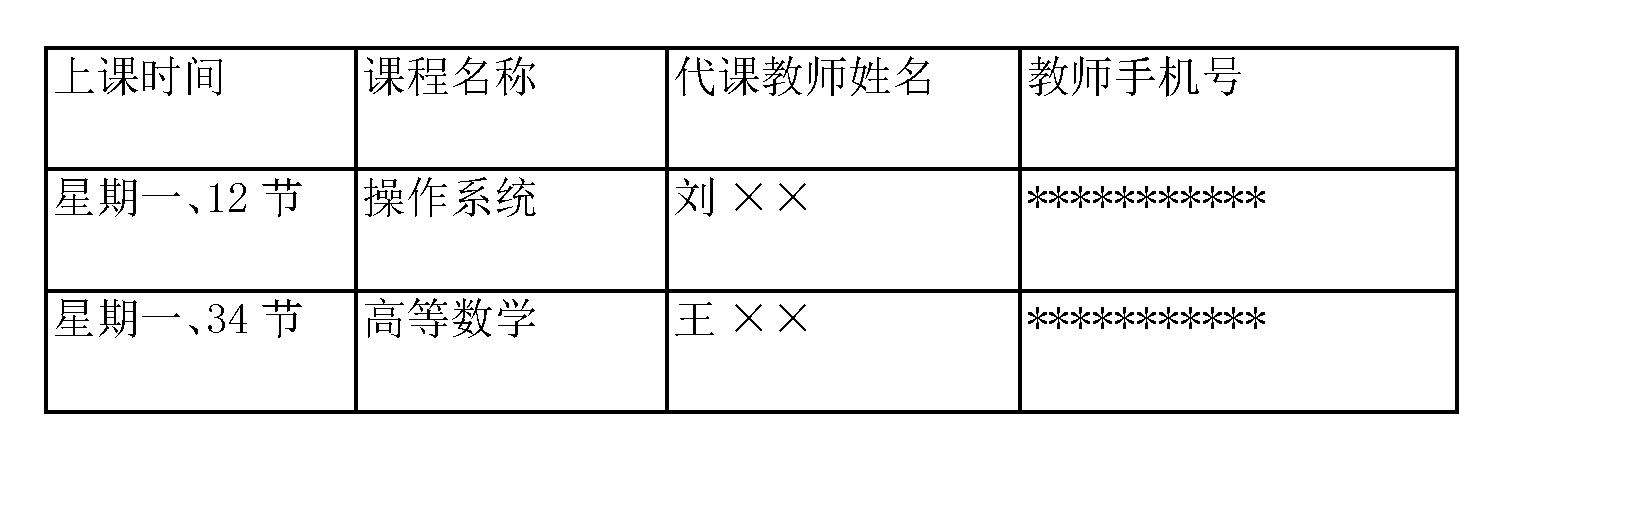 Figure CN104732604AD00062